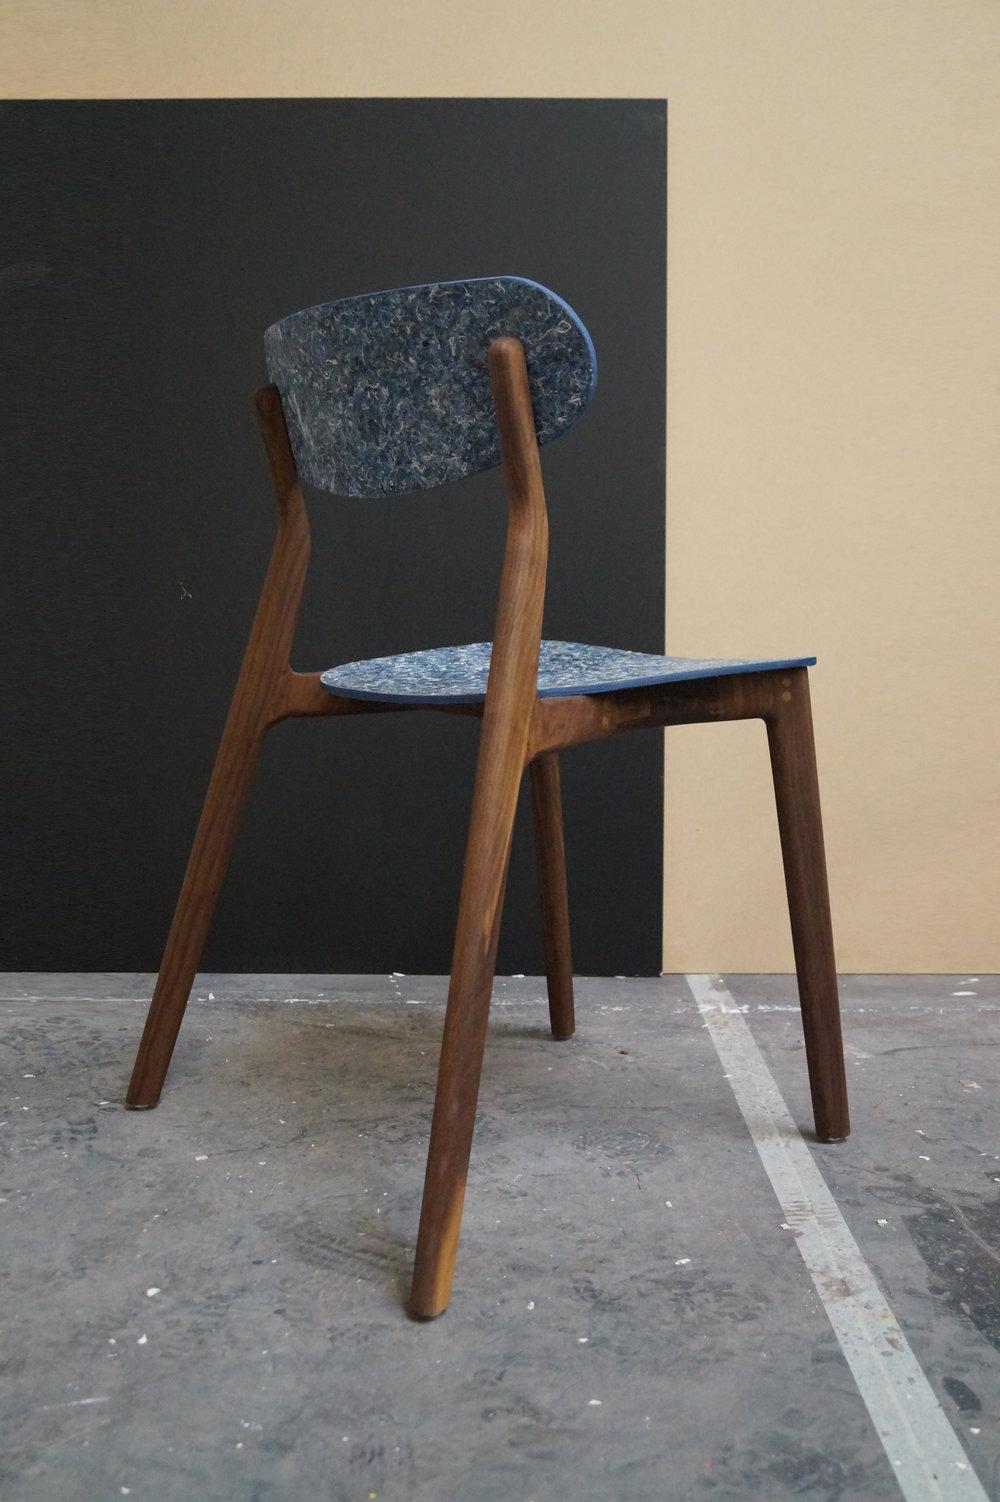 Ubu_Chair_Iso_05.jpg